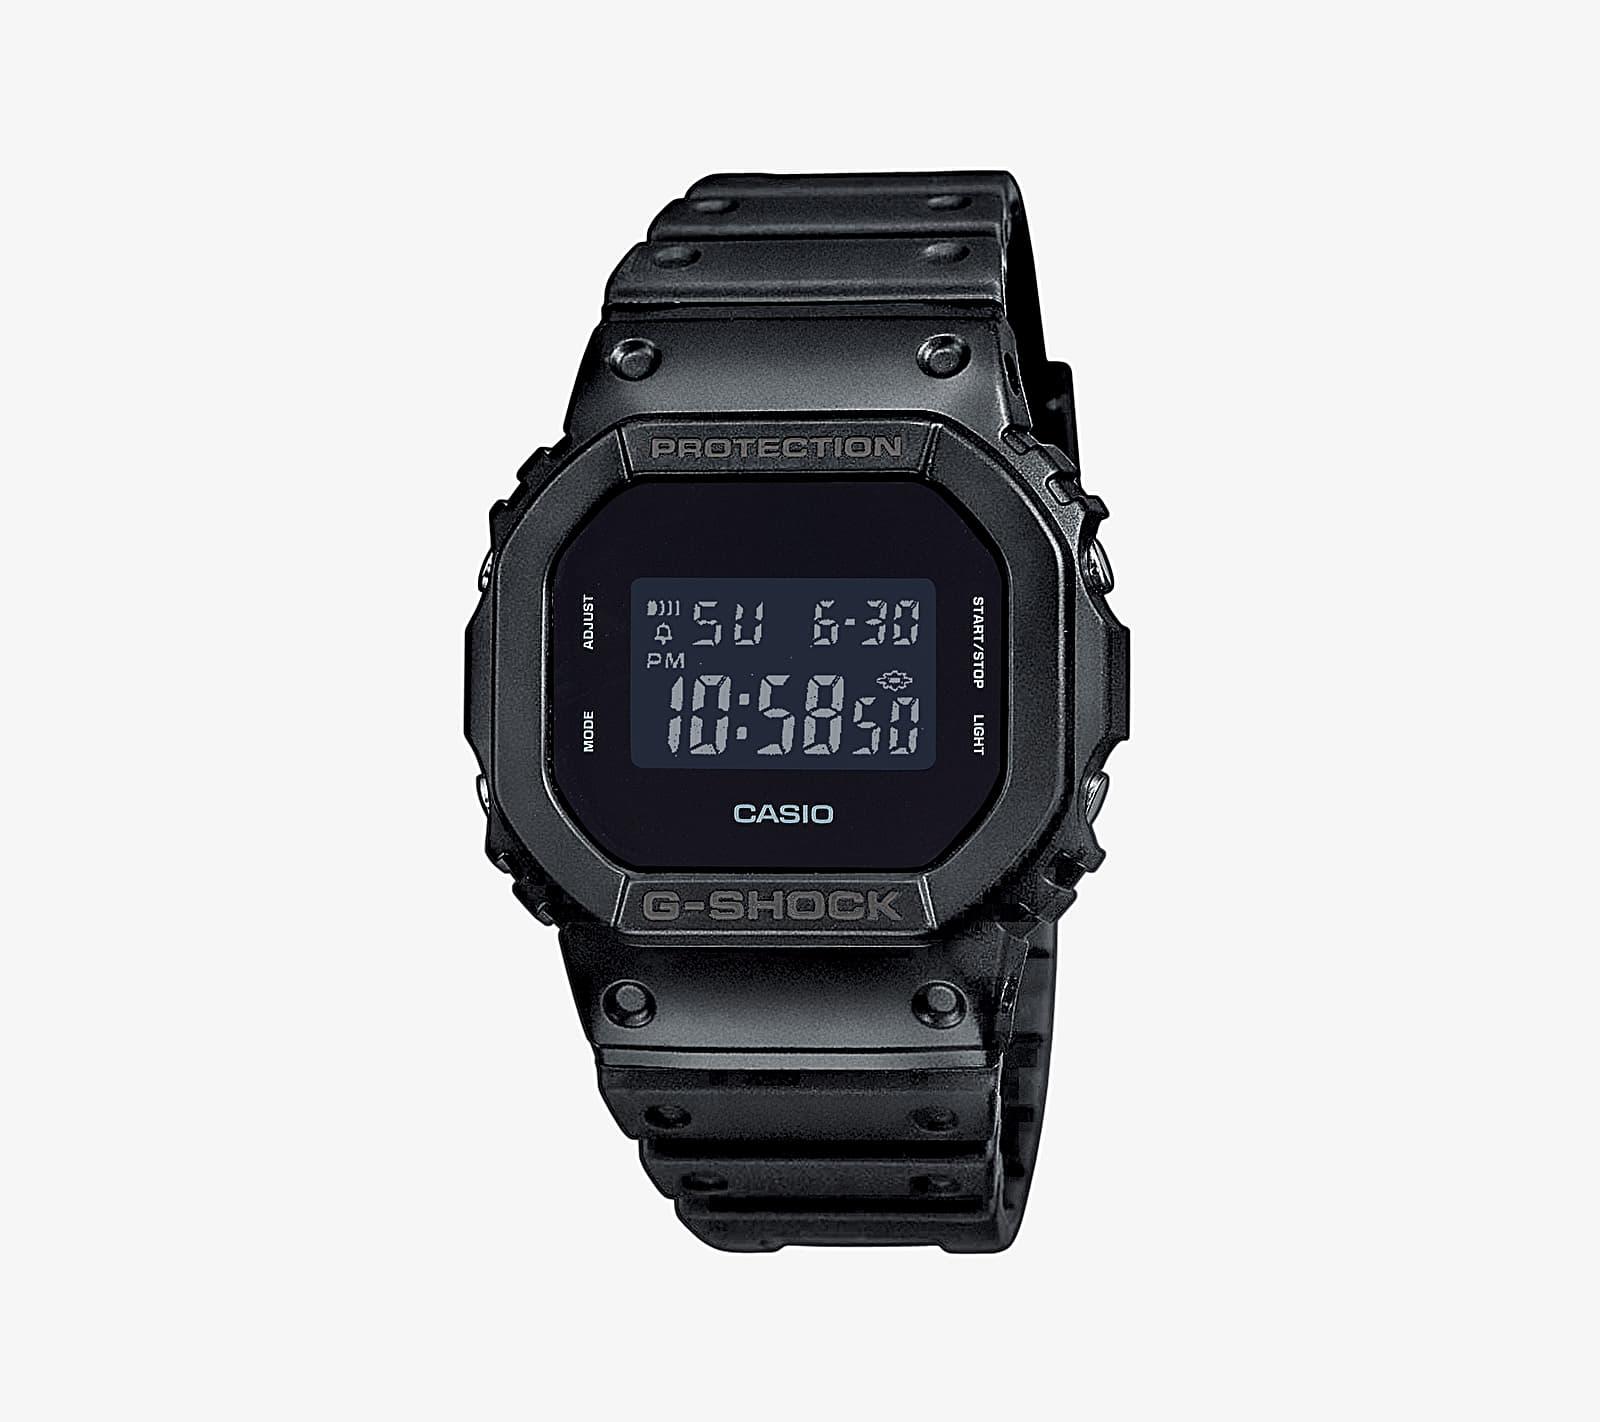 Casio G-shock DW-5600BB-1ER Watch Black univerzálna